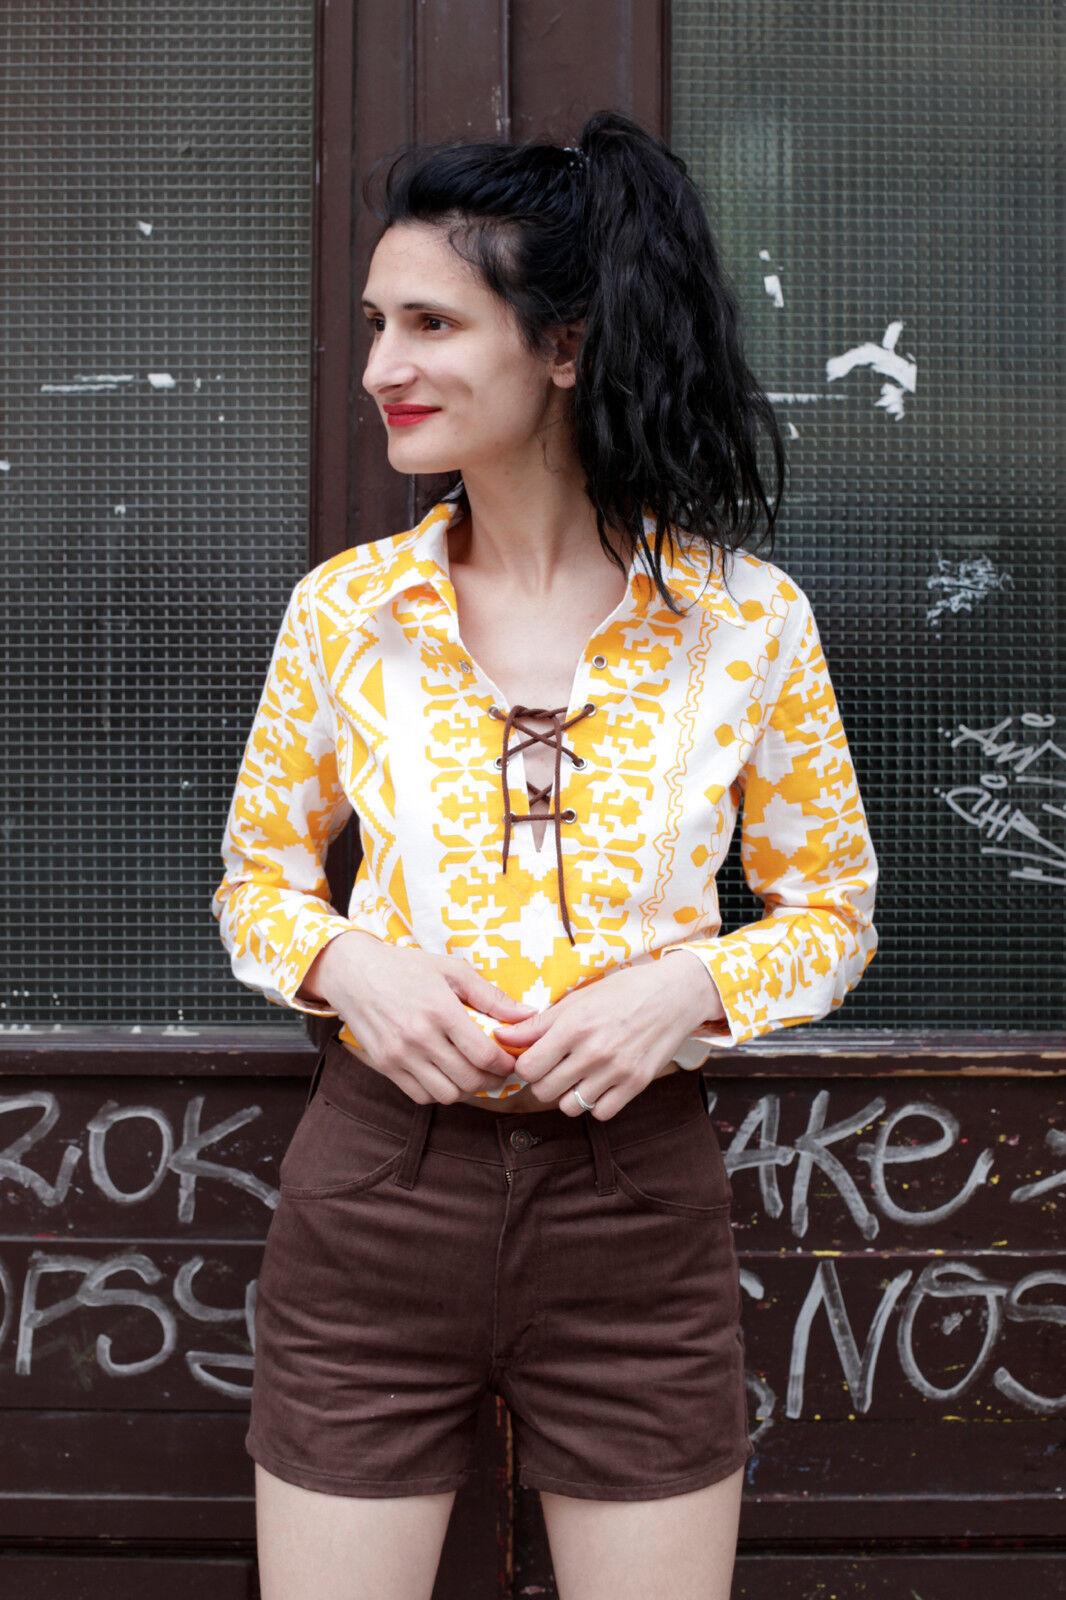 Jean Paul bluese Shirt Oberteil blouse 70er True VINTAGE 70´s BOHO Hippie selten